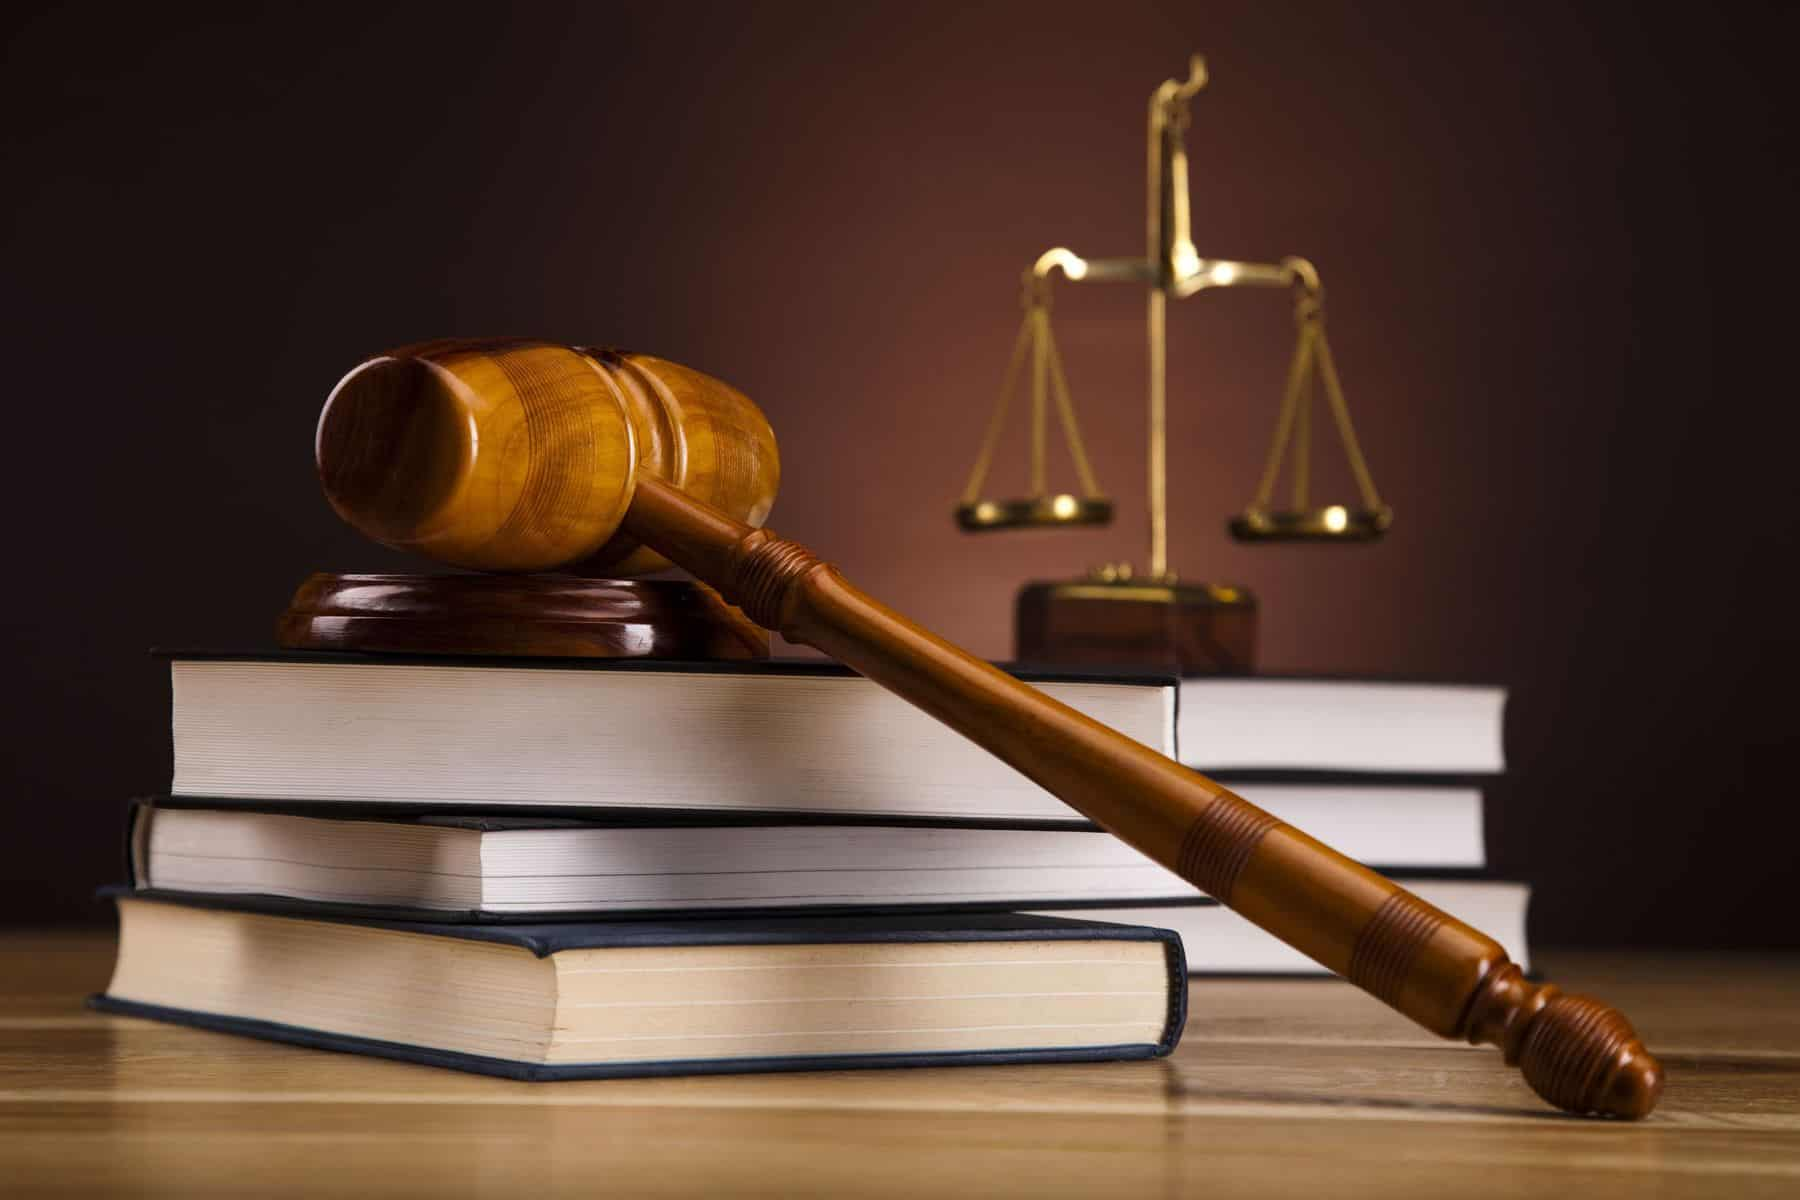 how to contest a will ·Shaffer Law ·Charleston WV | Shaffer Law · 103 Pennsylvania Ave, Charleston, WV 25302 · +1-304-400-4044 · https://www.shafferlawwv.com/